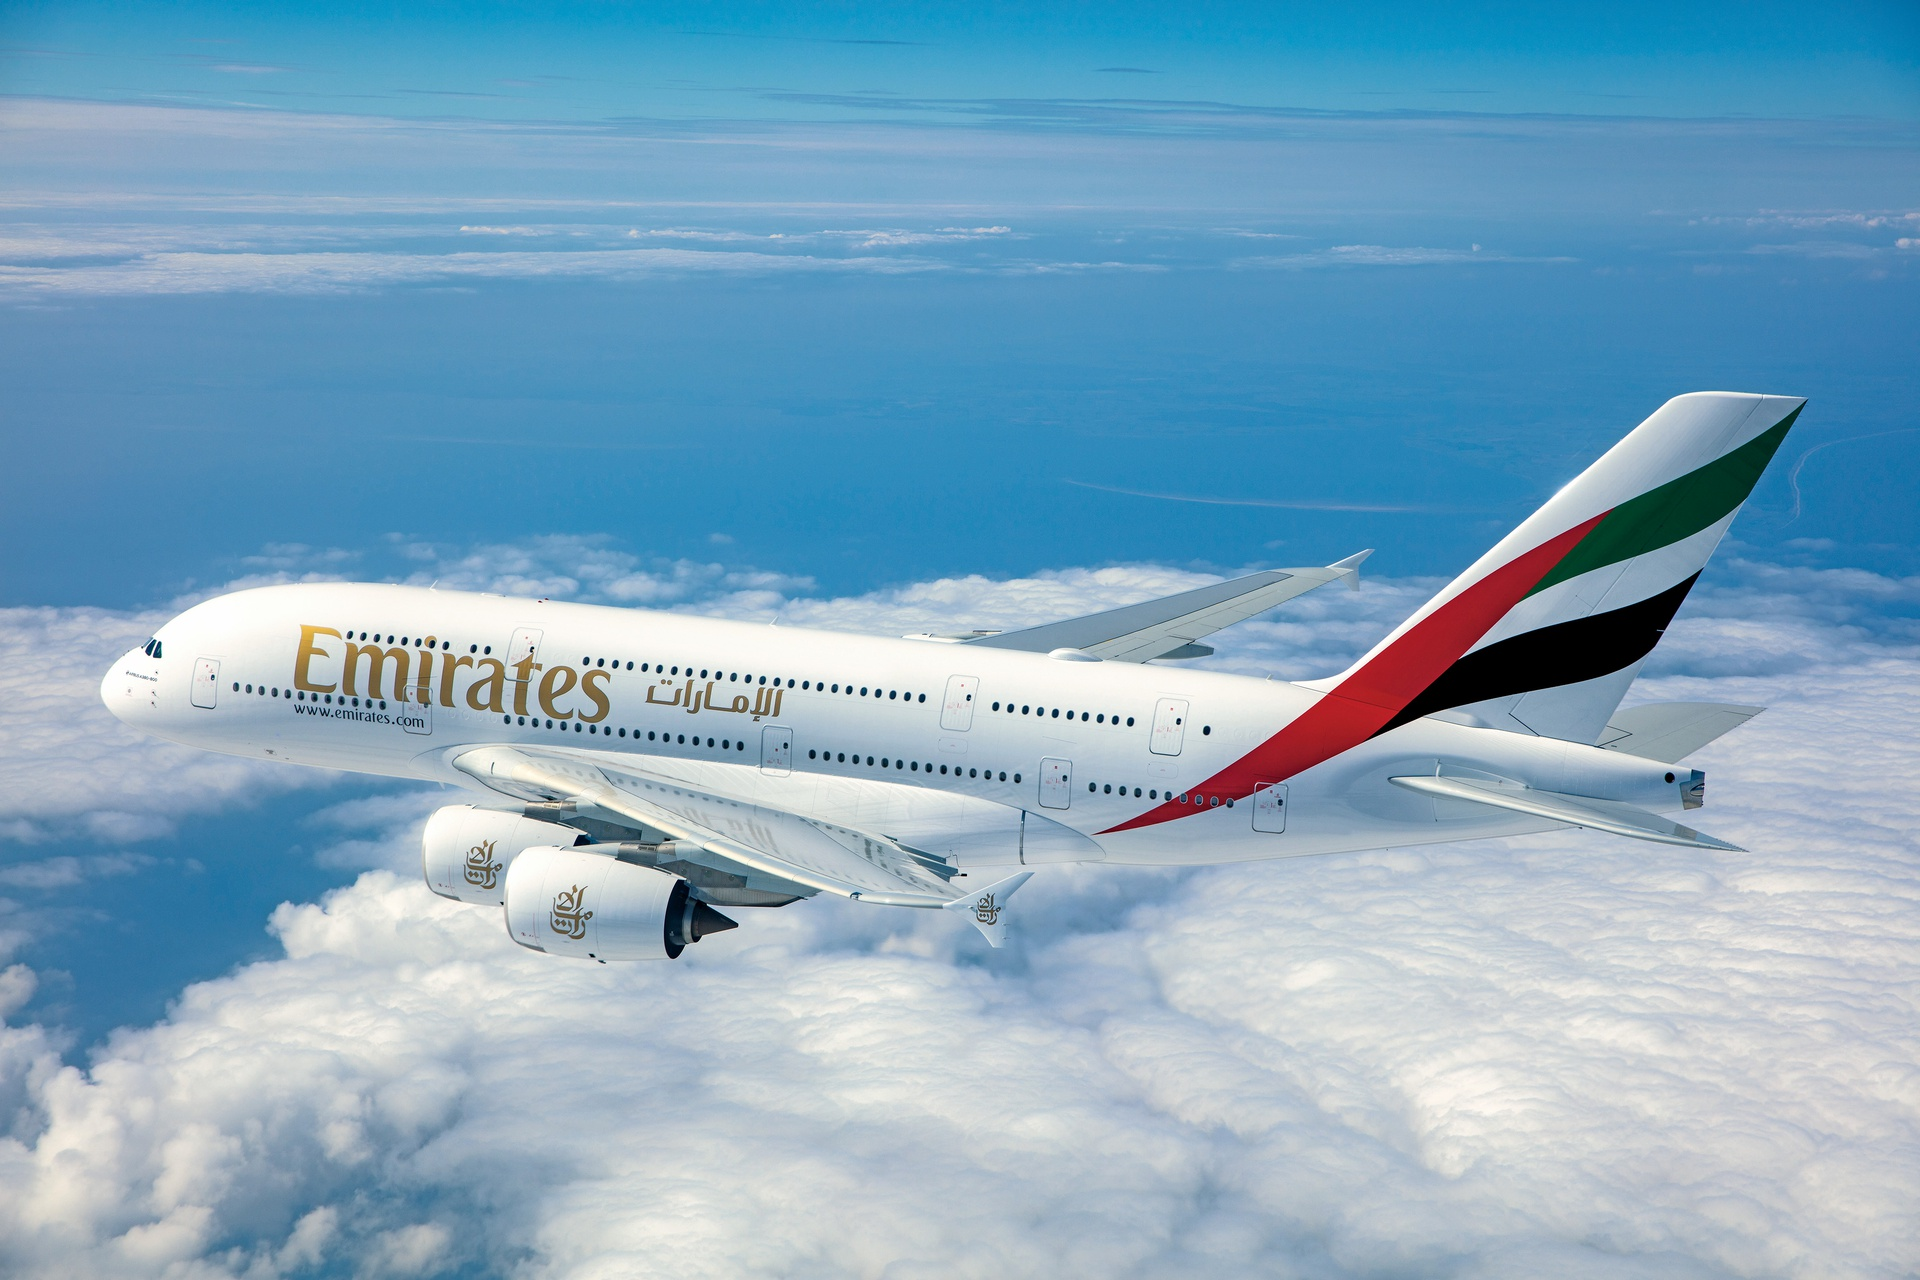 Emirates Skywards feiert 20-jähriges Jubiläum